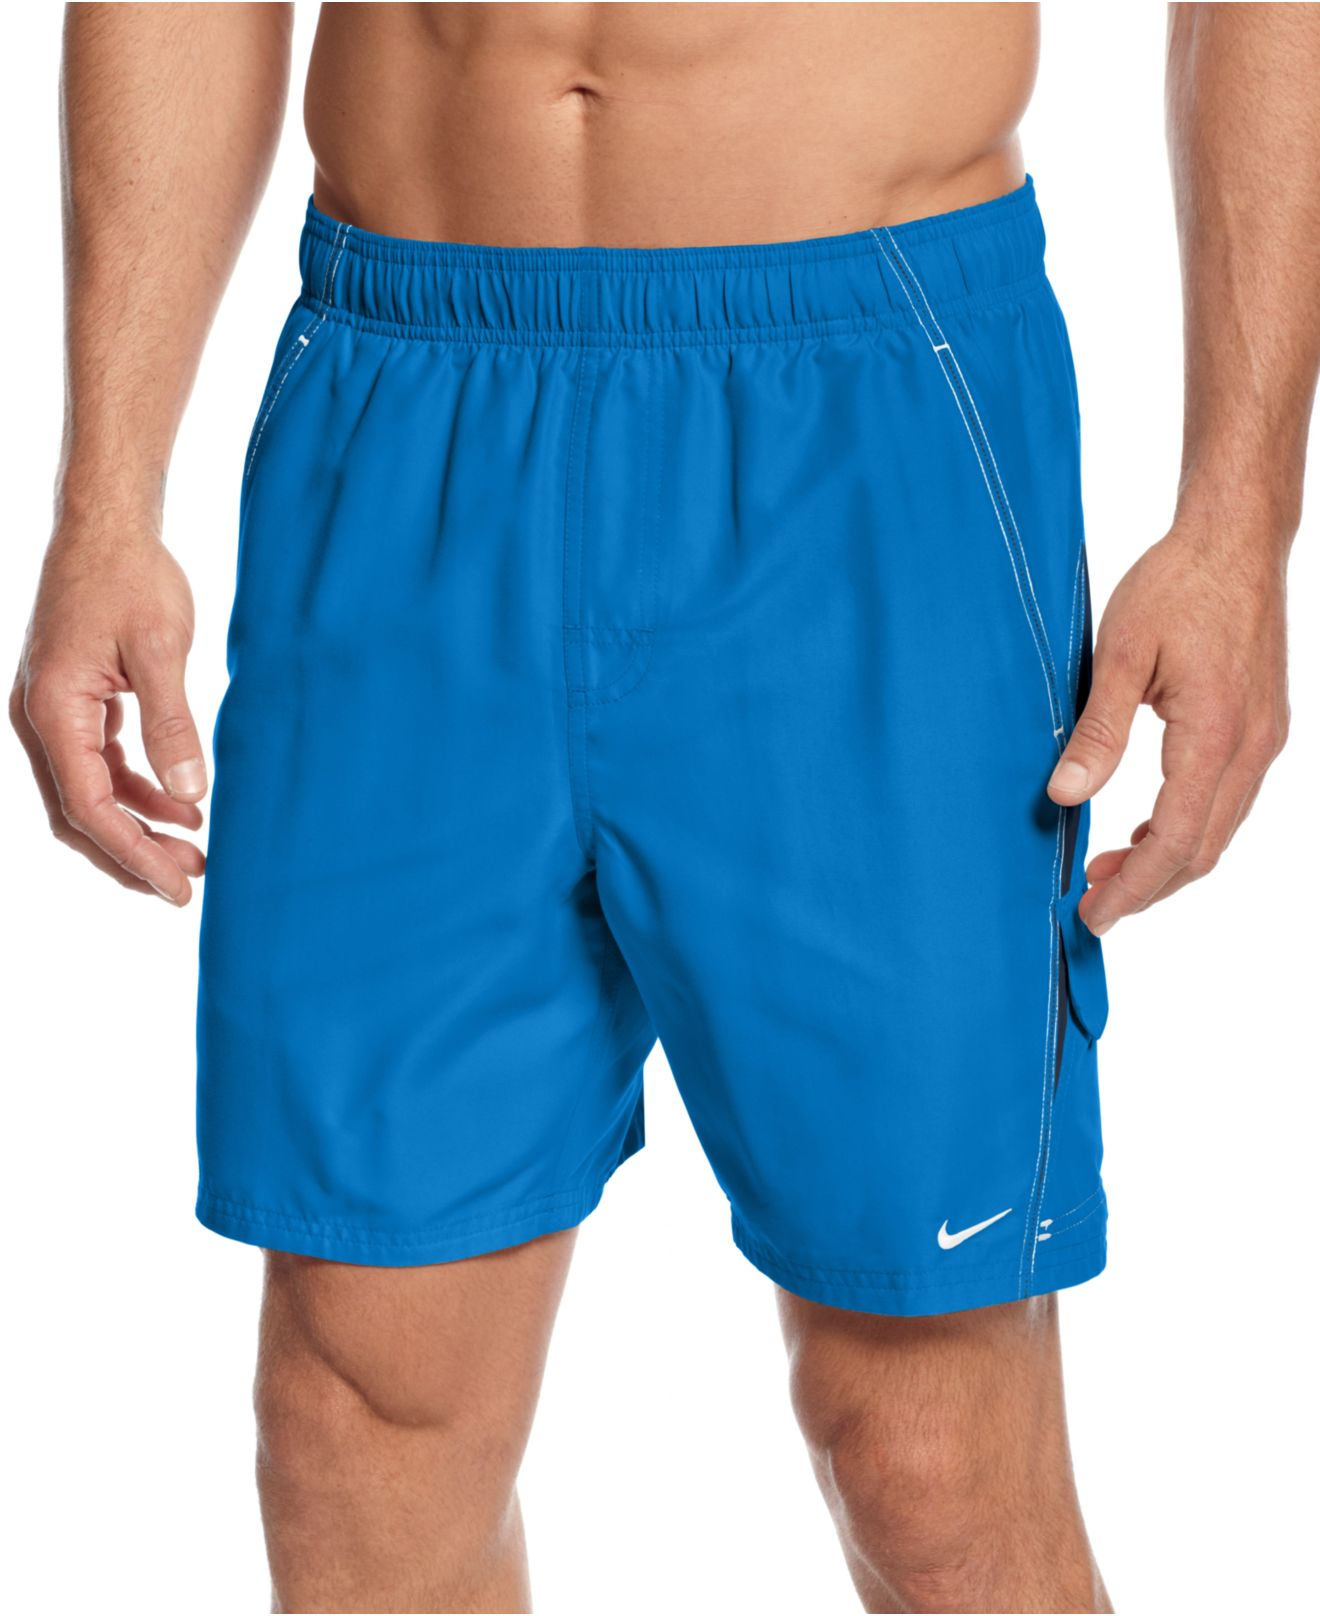 mens nike volley swim trunks